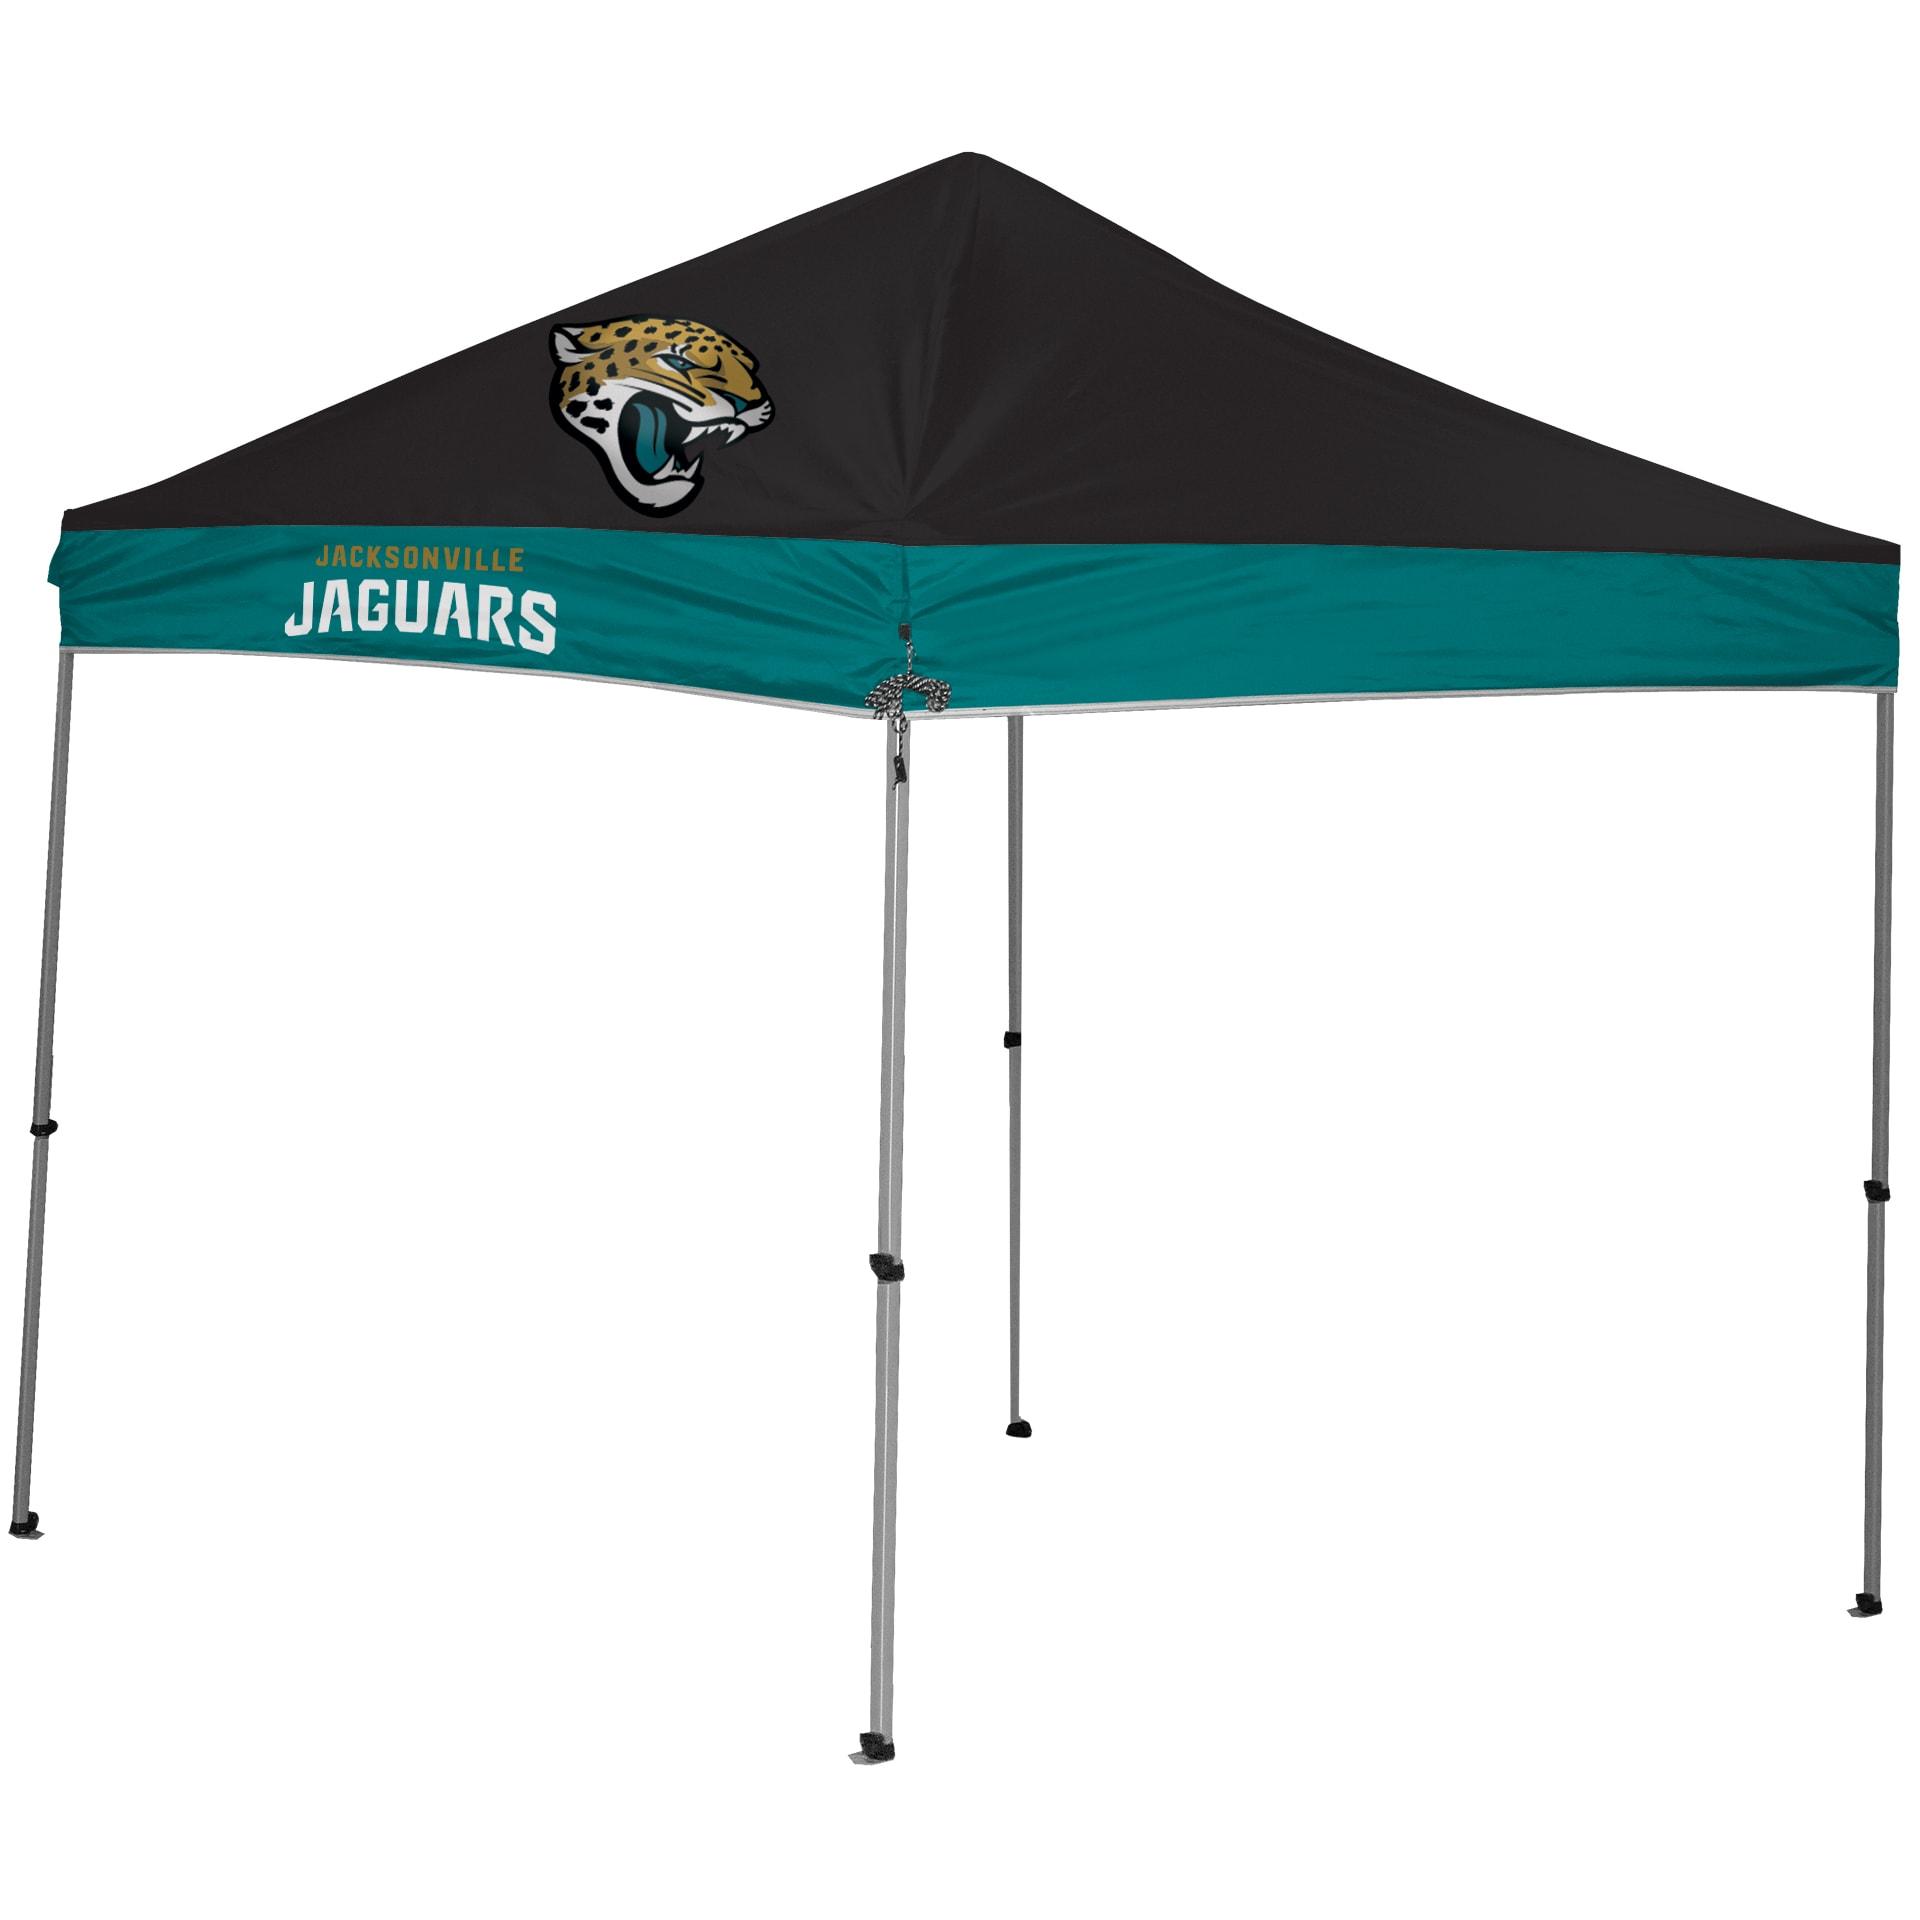 Jacksonville Jaguars 9' x 9' 2-Tone Straight Leg Canopy Tent